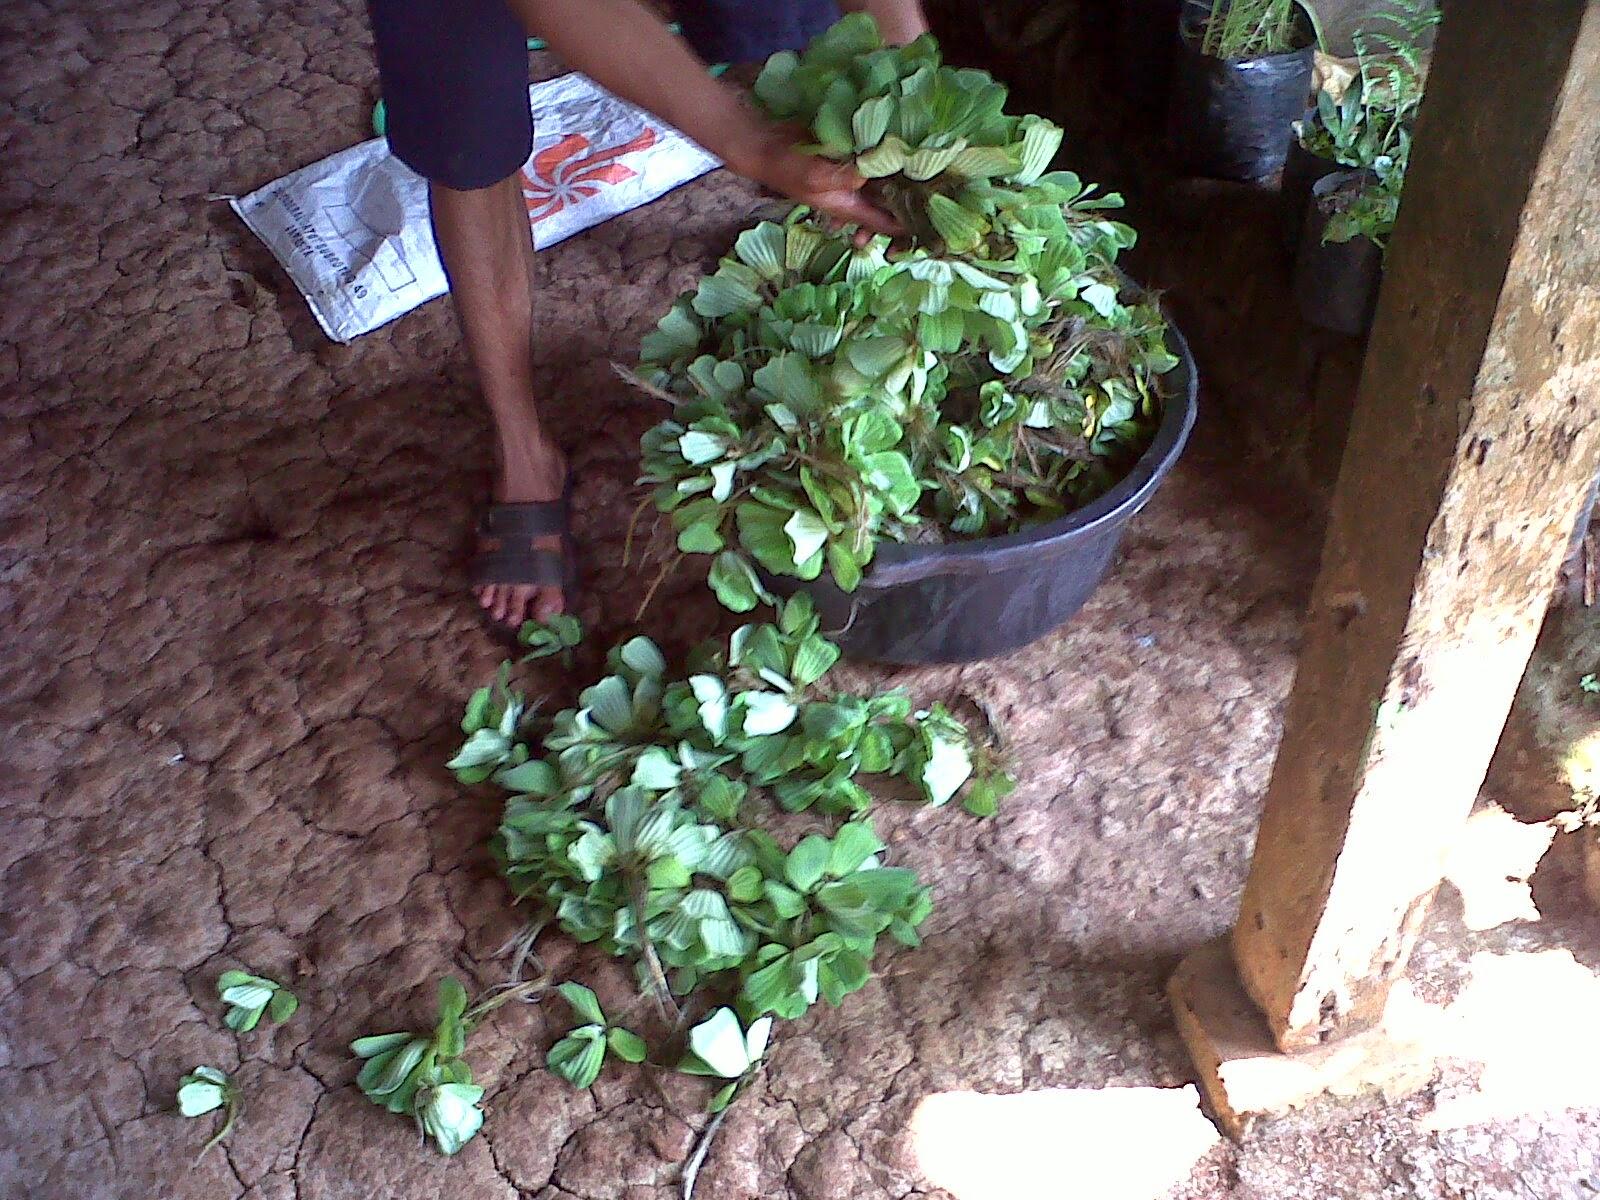 Tanaman Air Kapu-Kapu (Apu-Apu) | Suplier Tanaman Hias | Jasa Tukang Taman